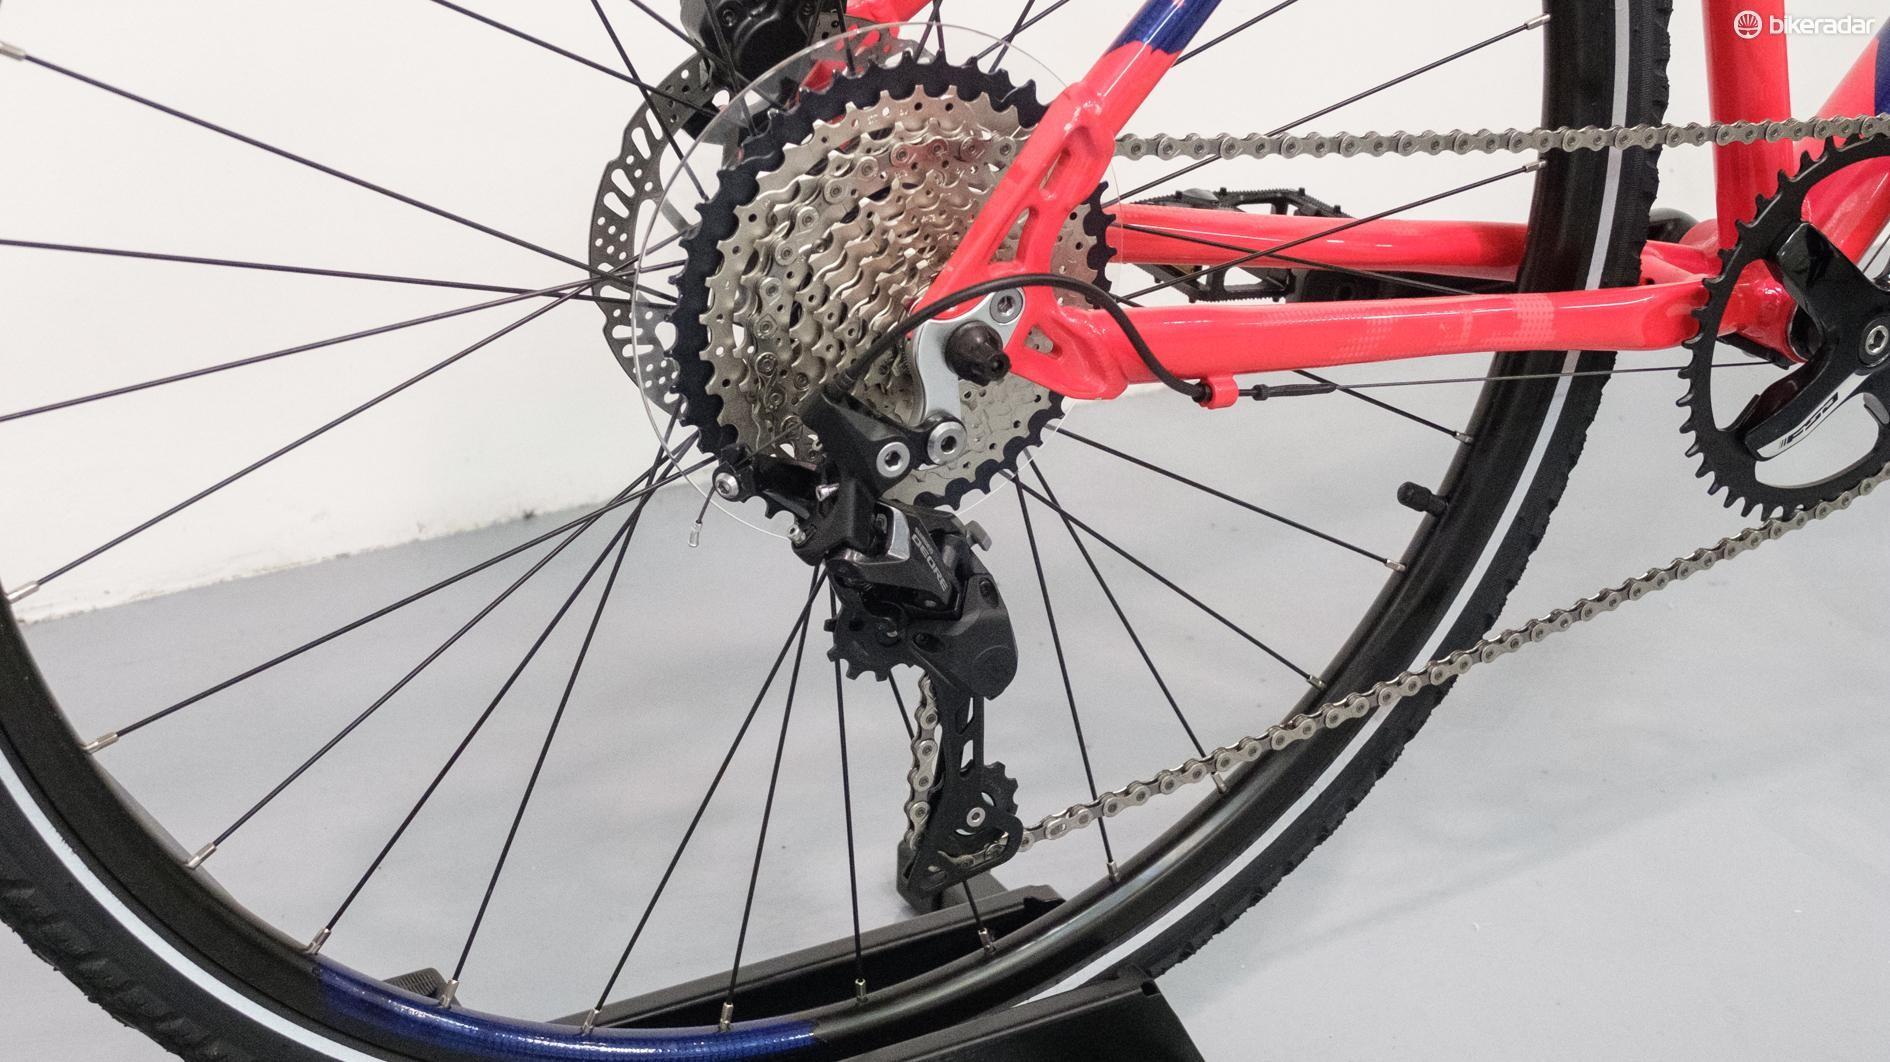 The bike is built around a proper 1x drivetrain